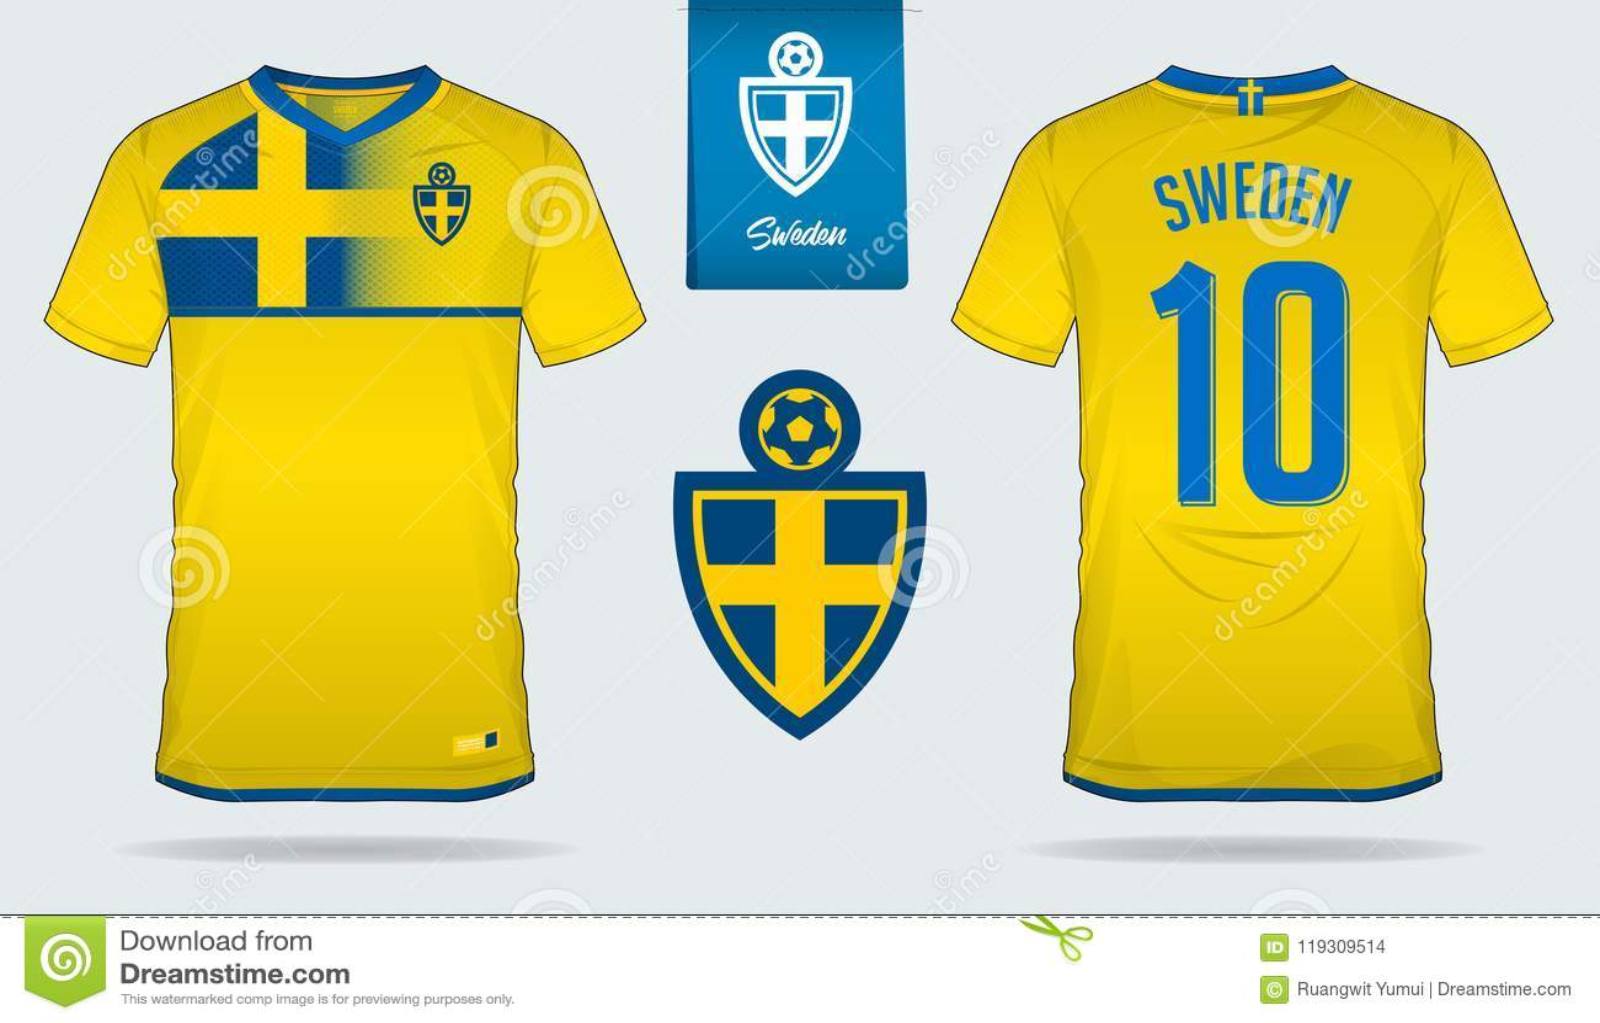 Soccer Jersey Or Football Kit Template Design For Sweden National